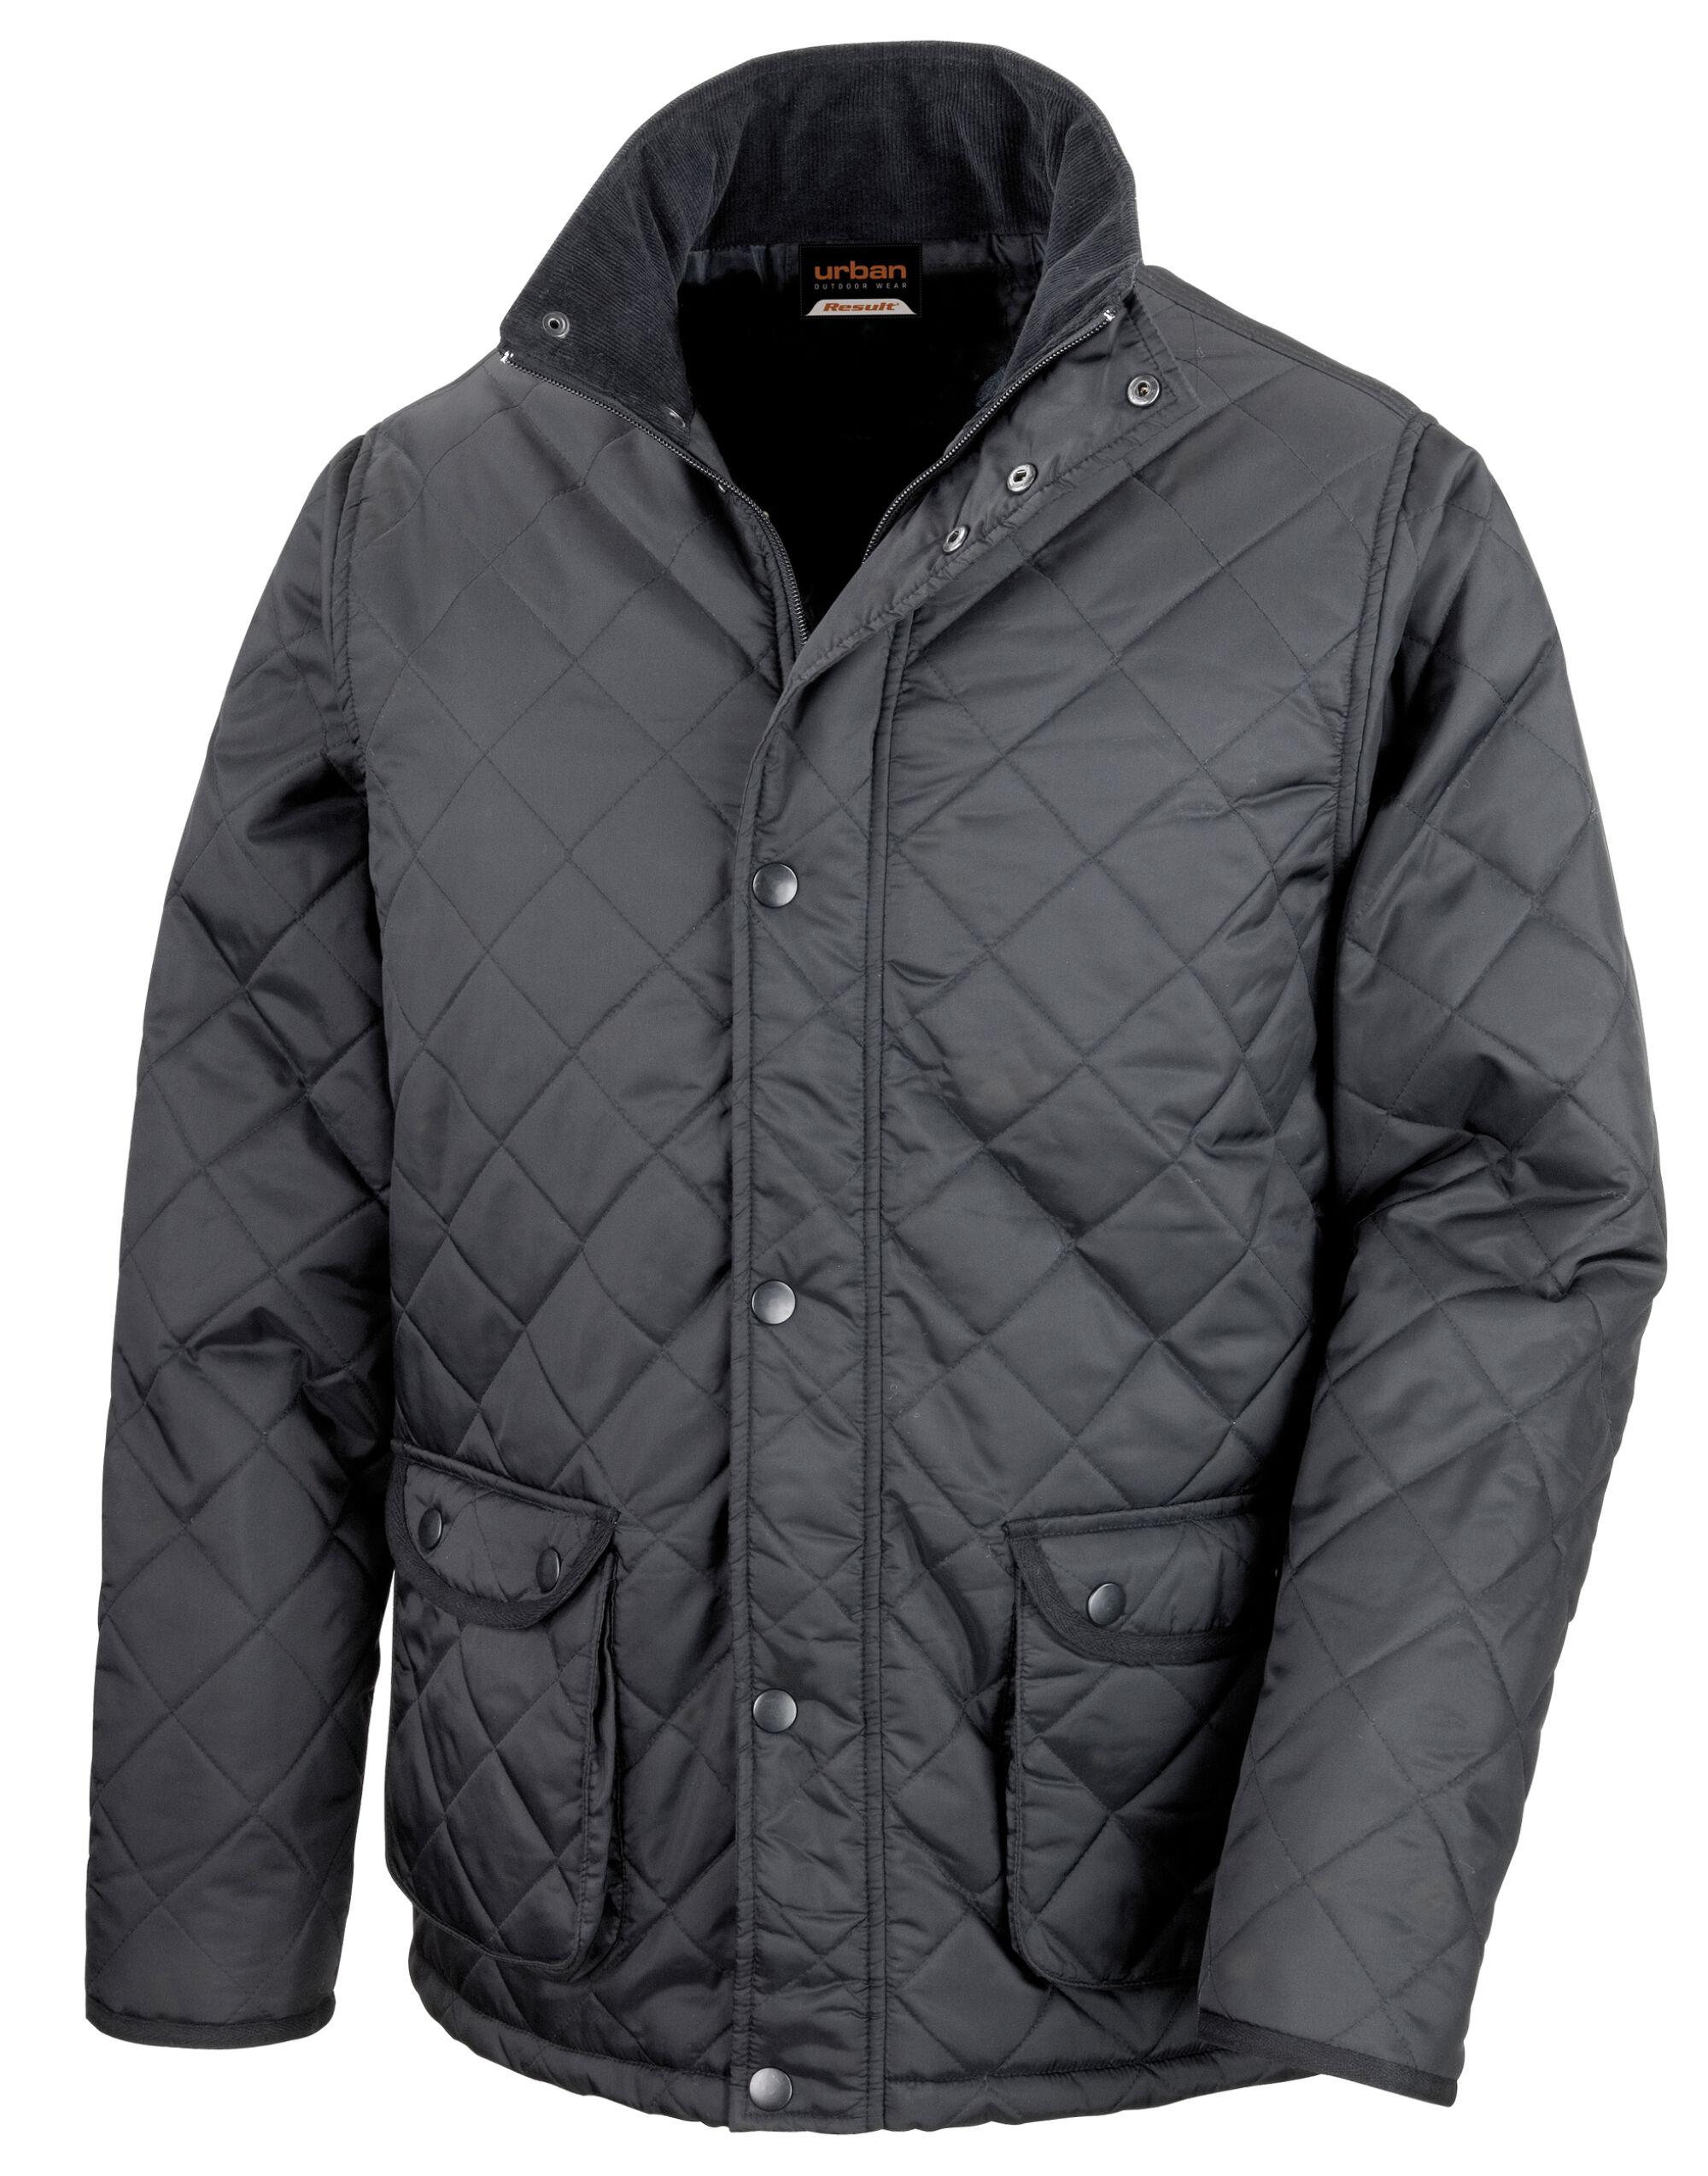 Urban Cheltenham Jacket